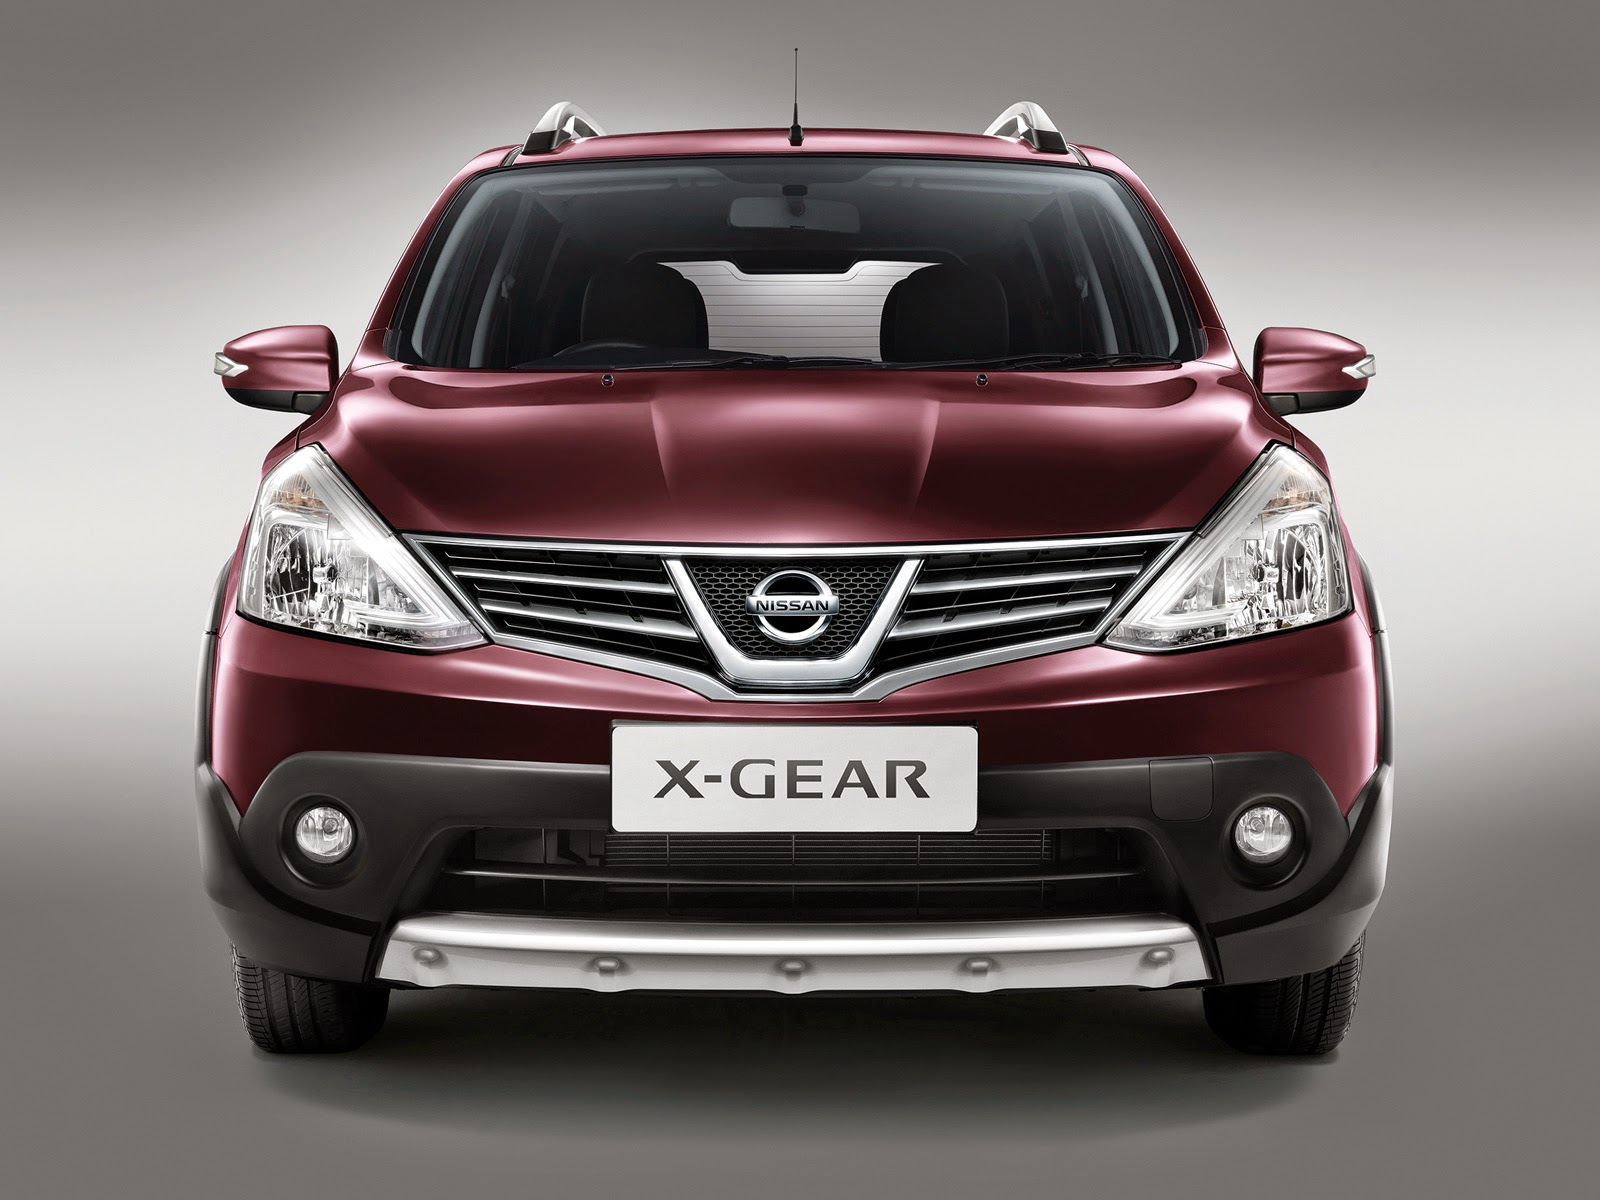 Window grille kota kinabalu - Nissan Livina X Gear